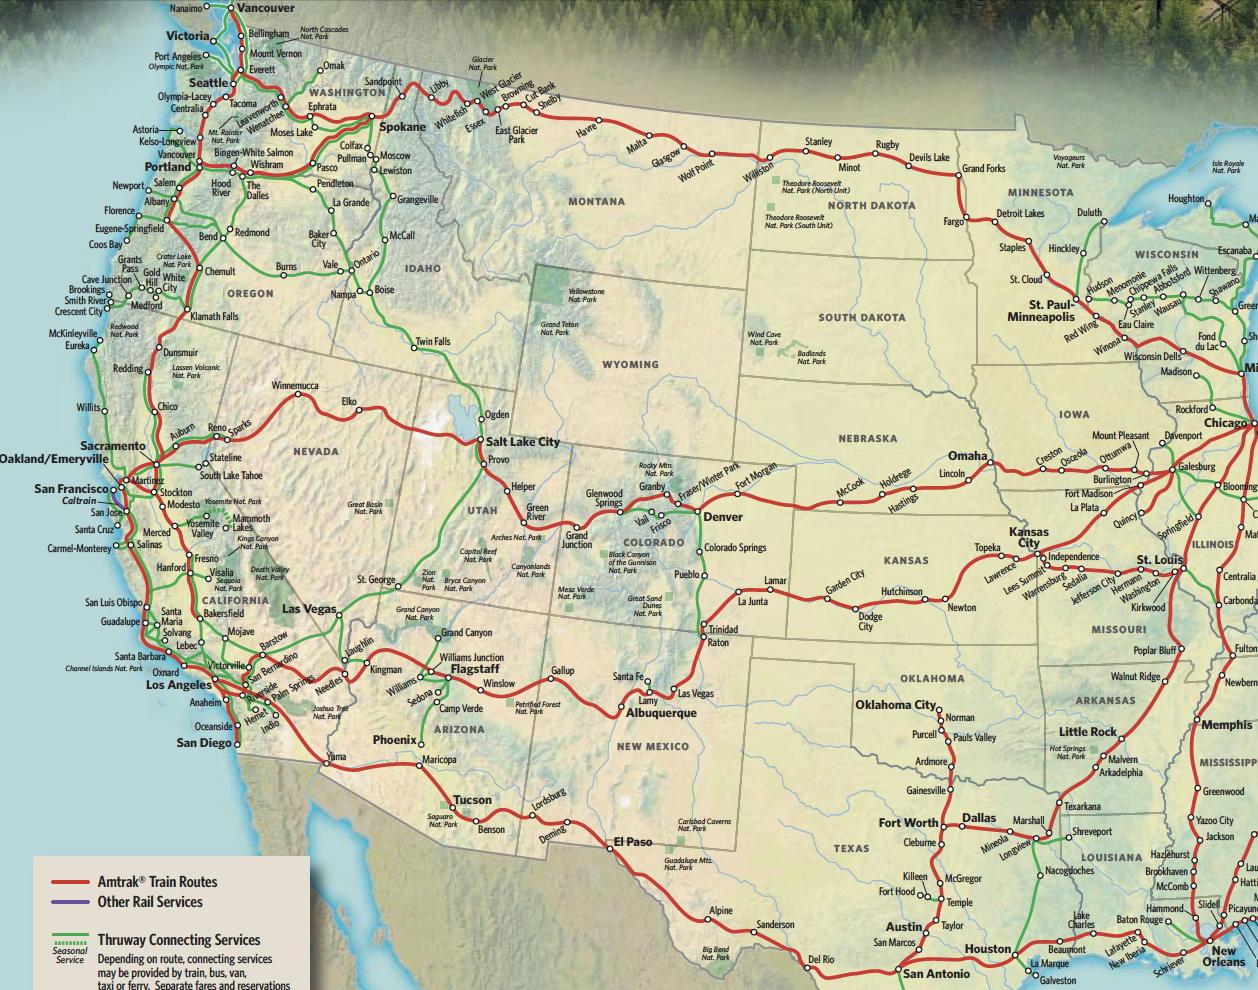 Train Links California State Map California Zephyr Route Map - Amtrak California Zephyr Map